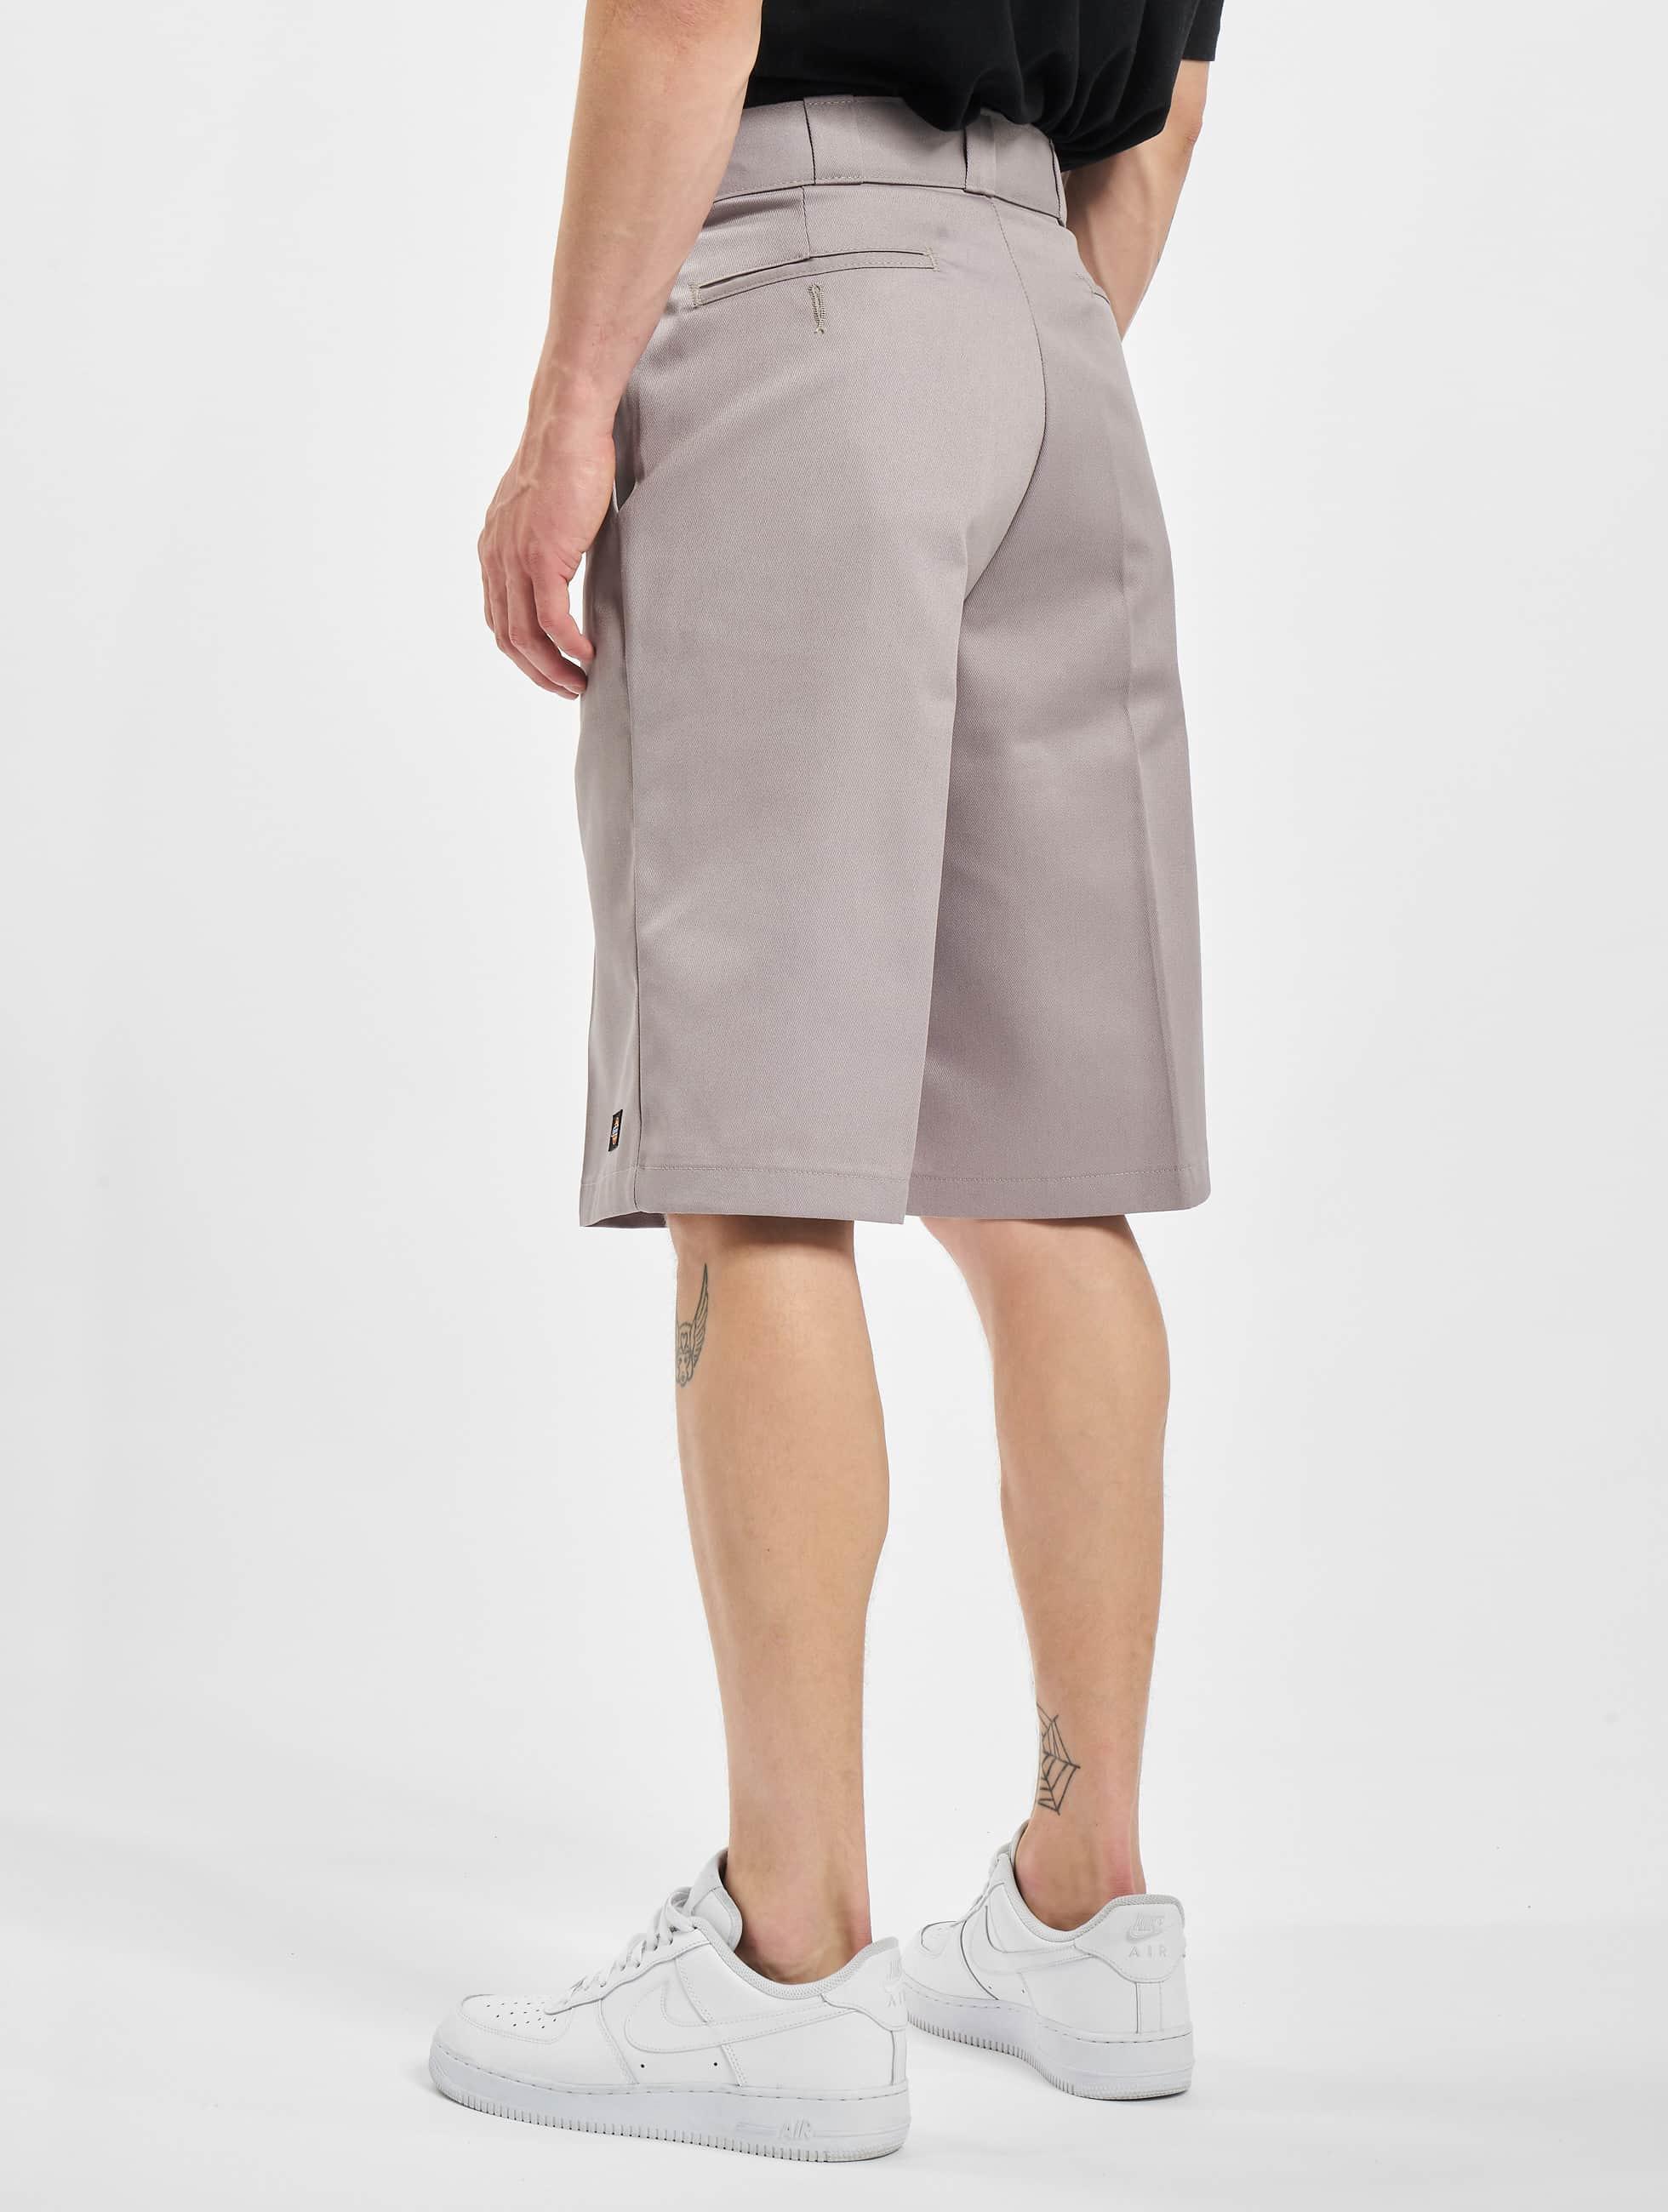 "Dickies shorts ""13"""" Multi-Use Pocket Work"" grijs"